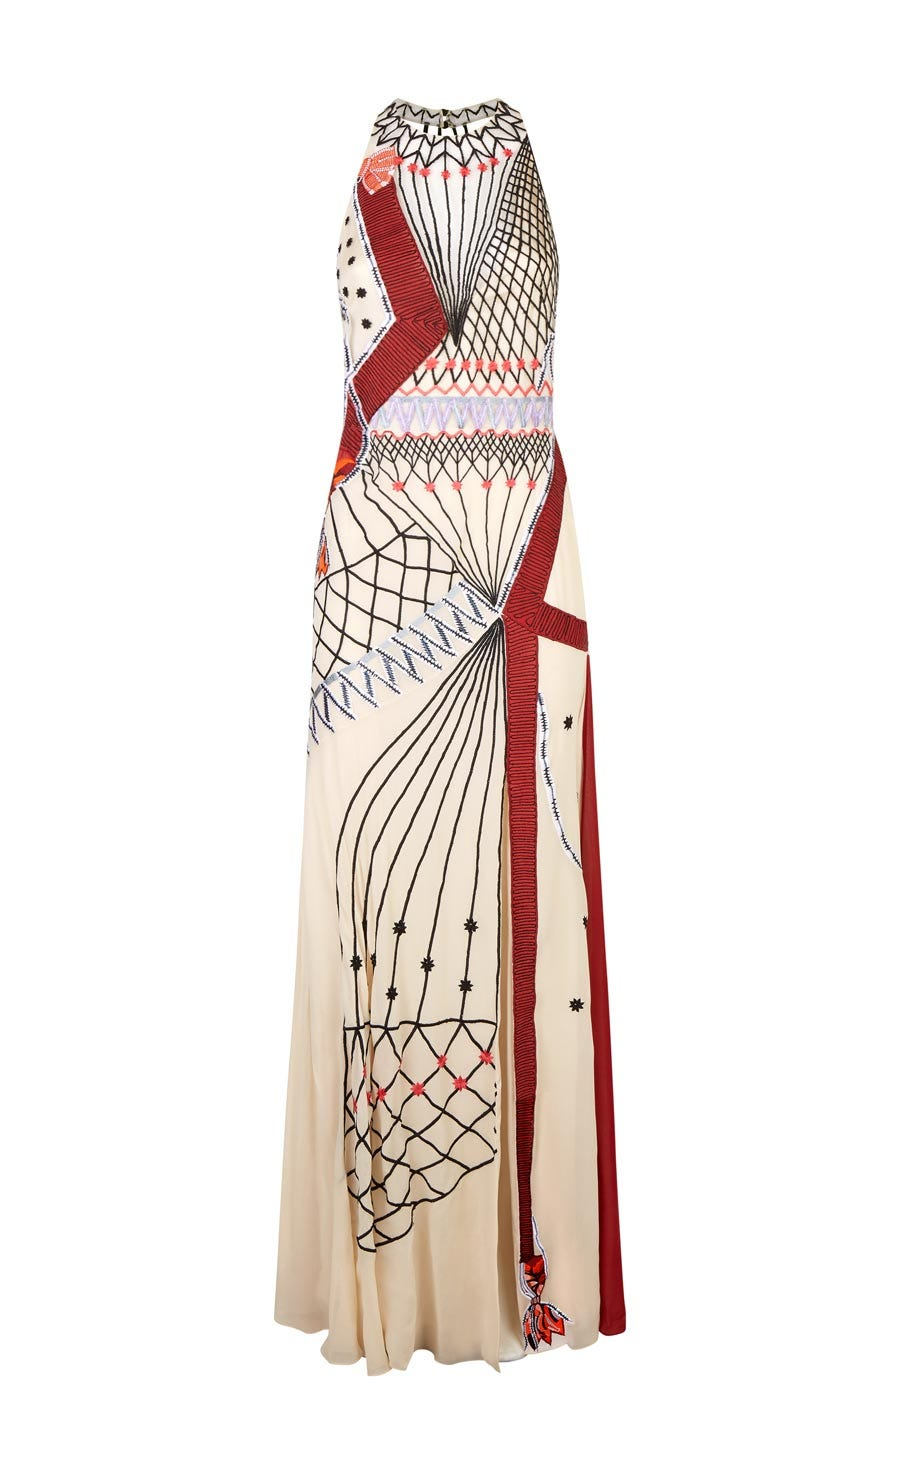 Kite Gown